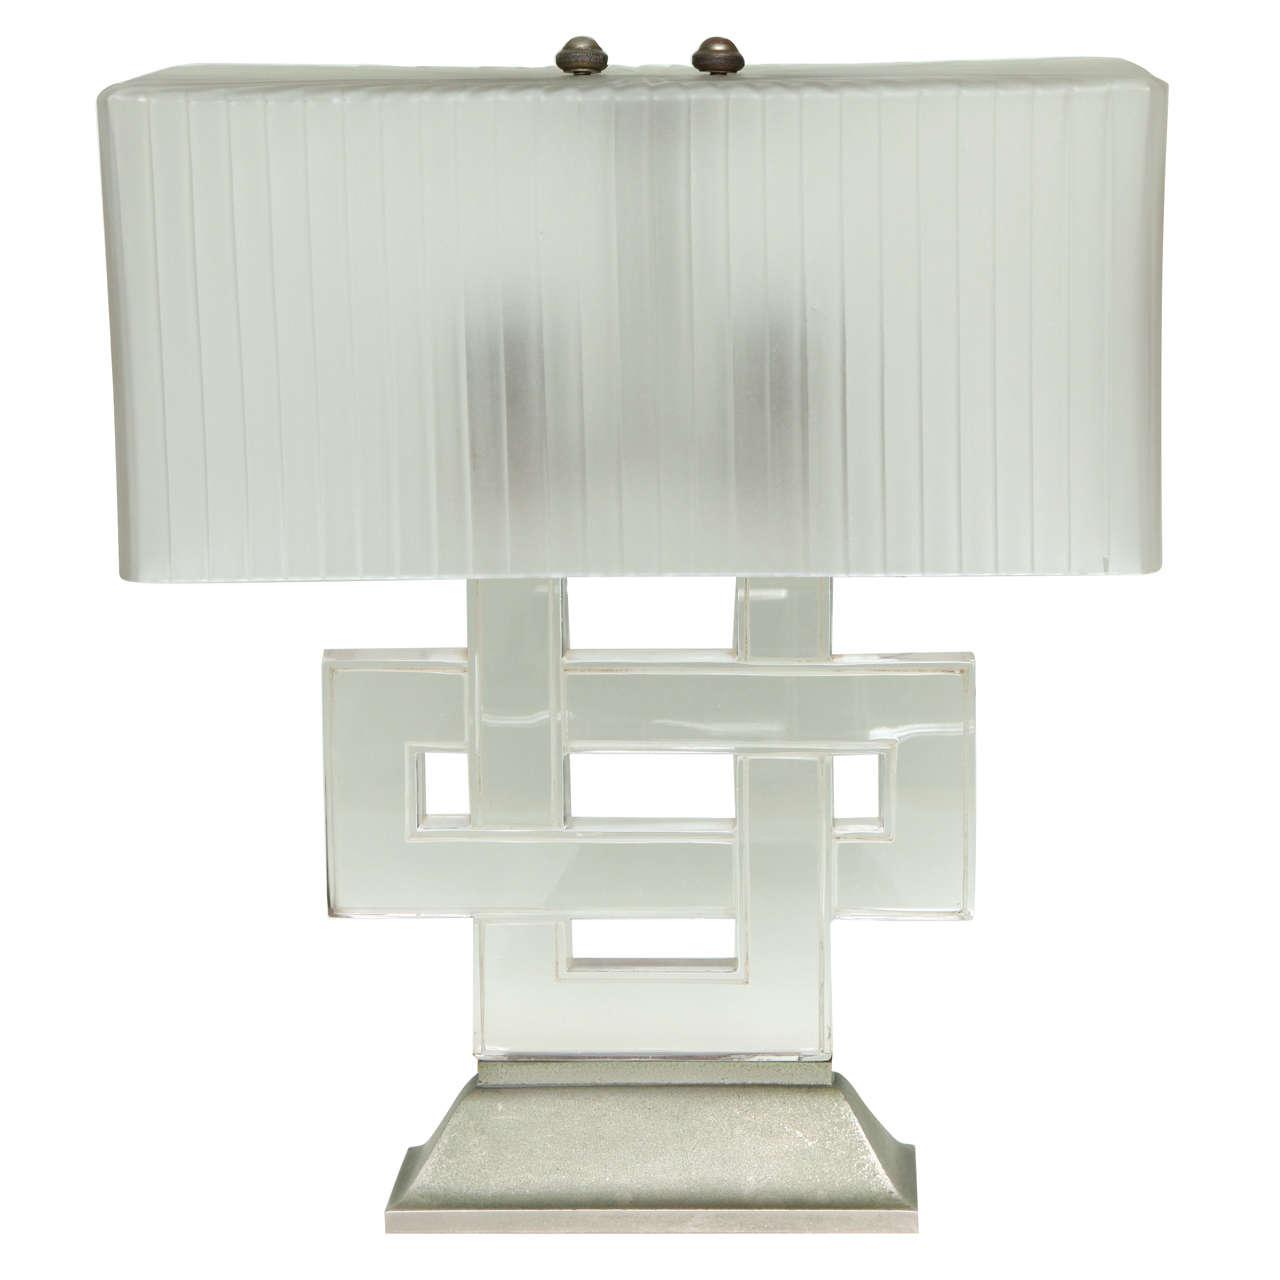 Art deco table lamp entrelacs by rene lalique paul stamati gallery aloadofball Images